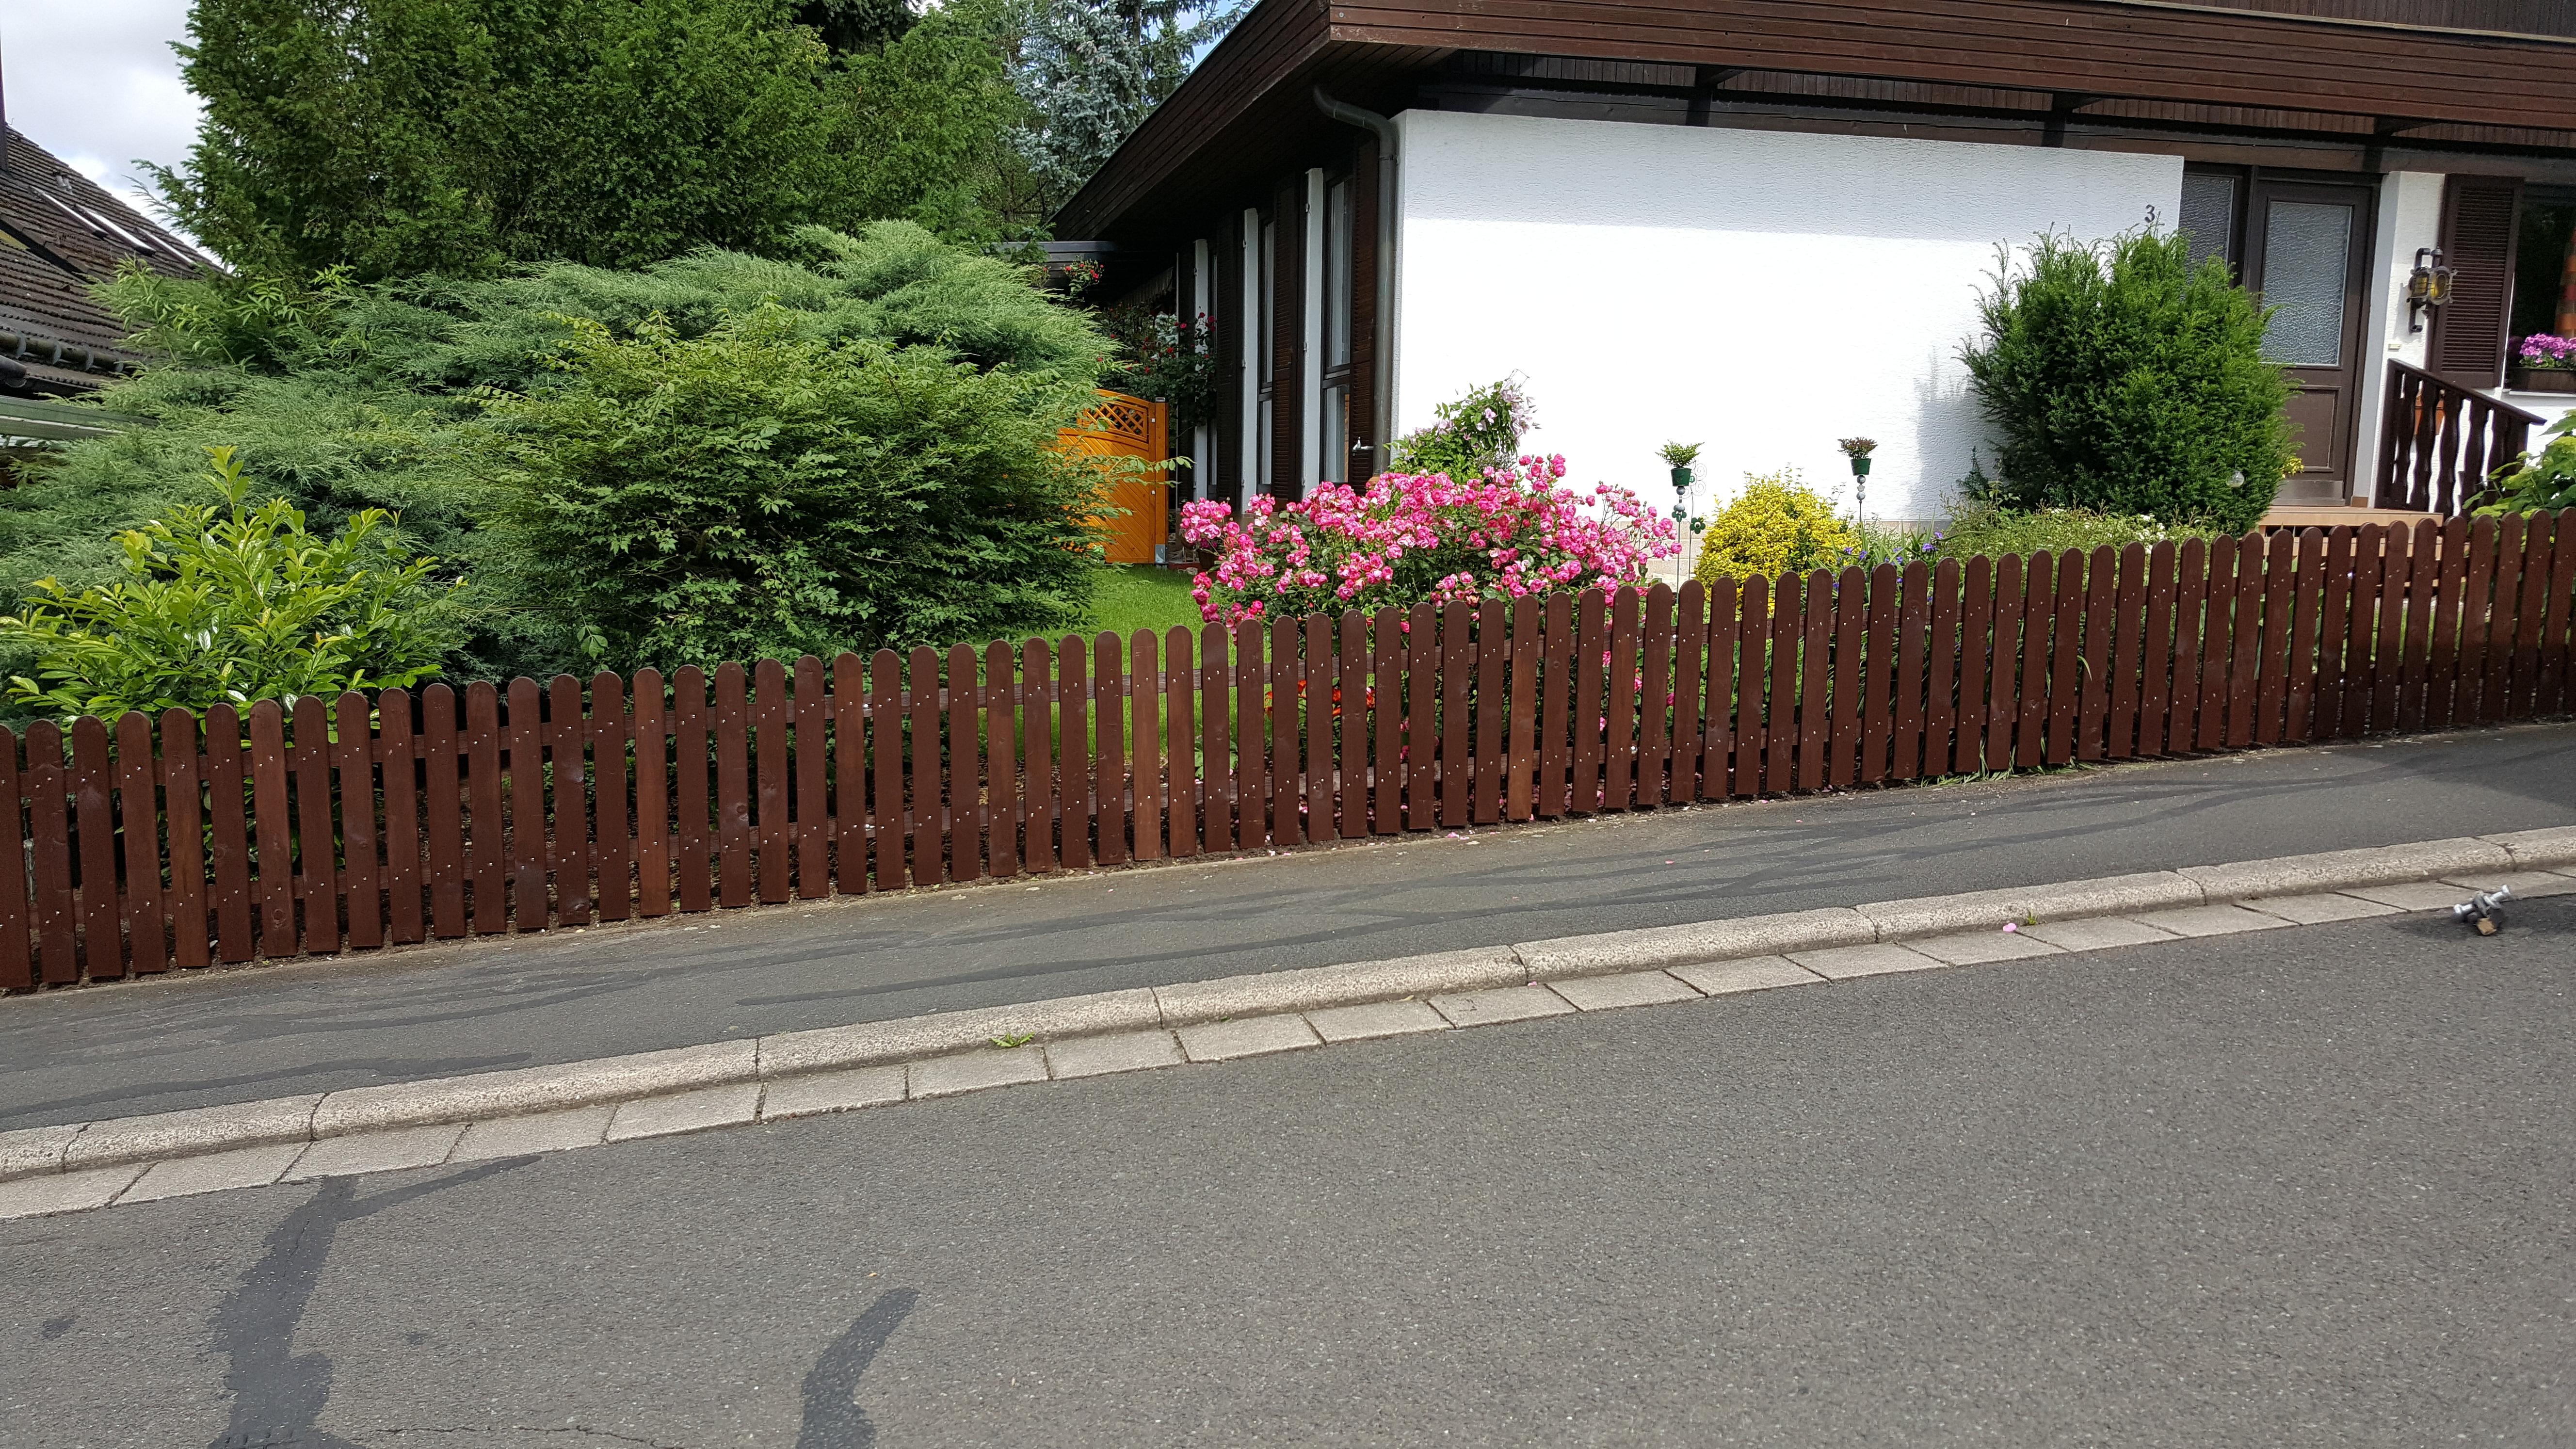 Zaunbau aus Rundkopflatten